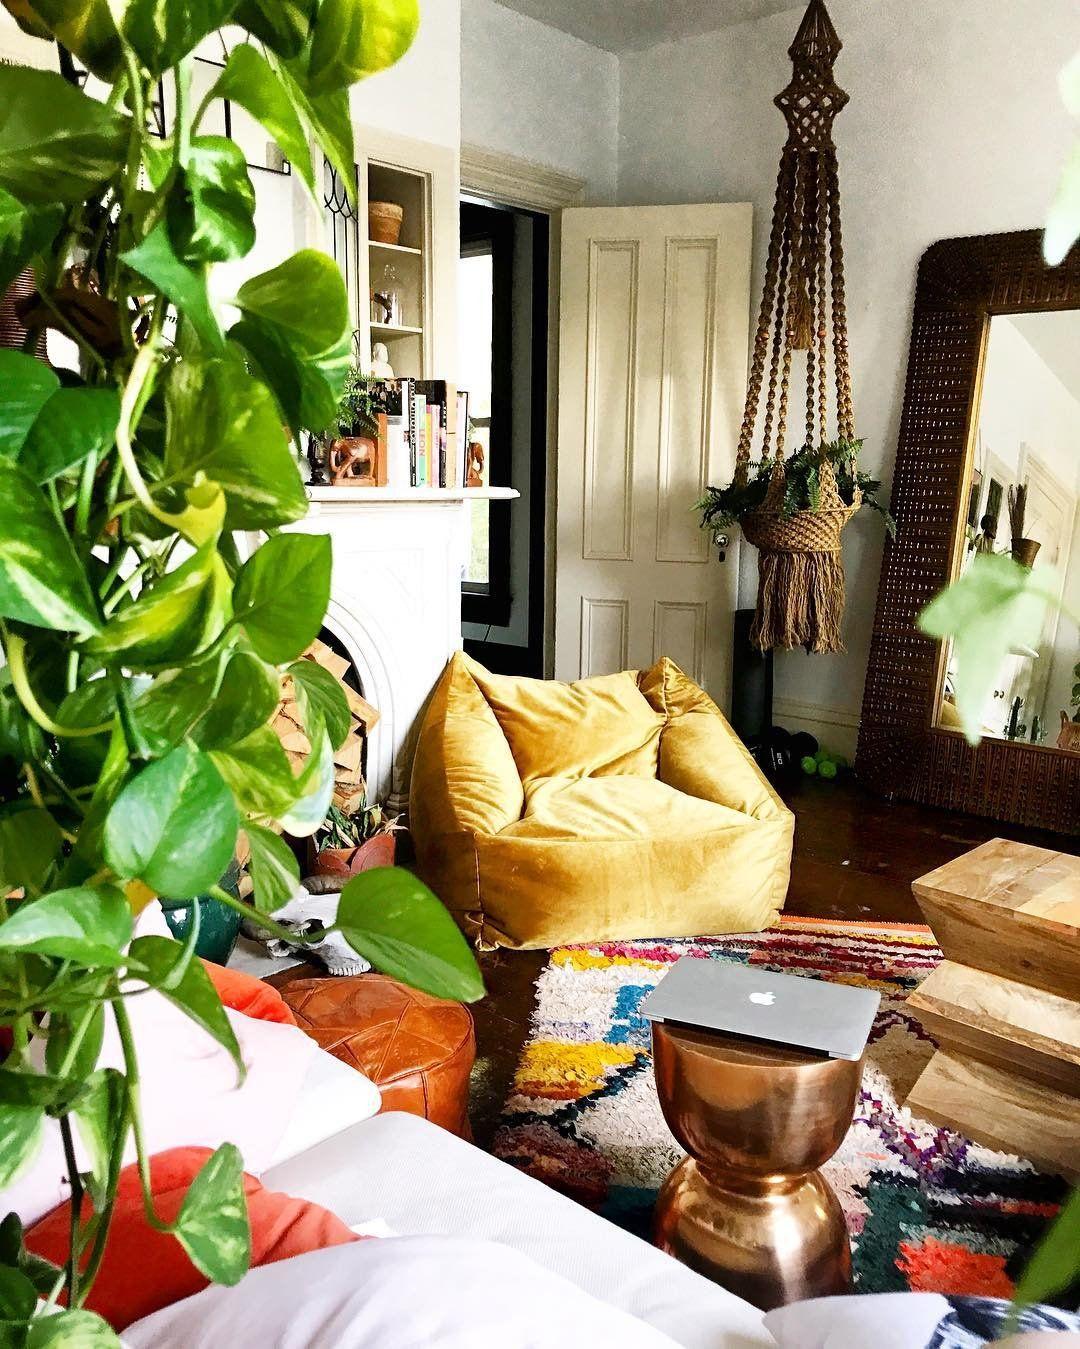 865 Likes 22 Comments Kara Evans Kara Evans On Instagram Vintage Home Decor Home Decor Apartment Decor